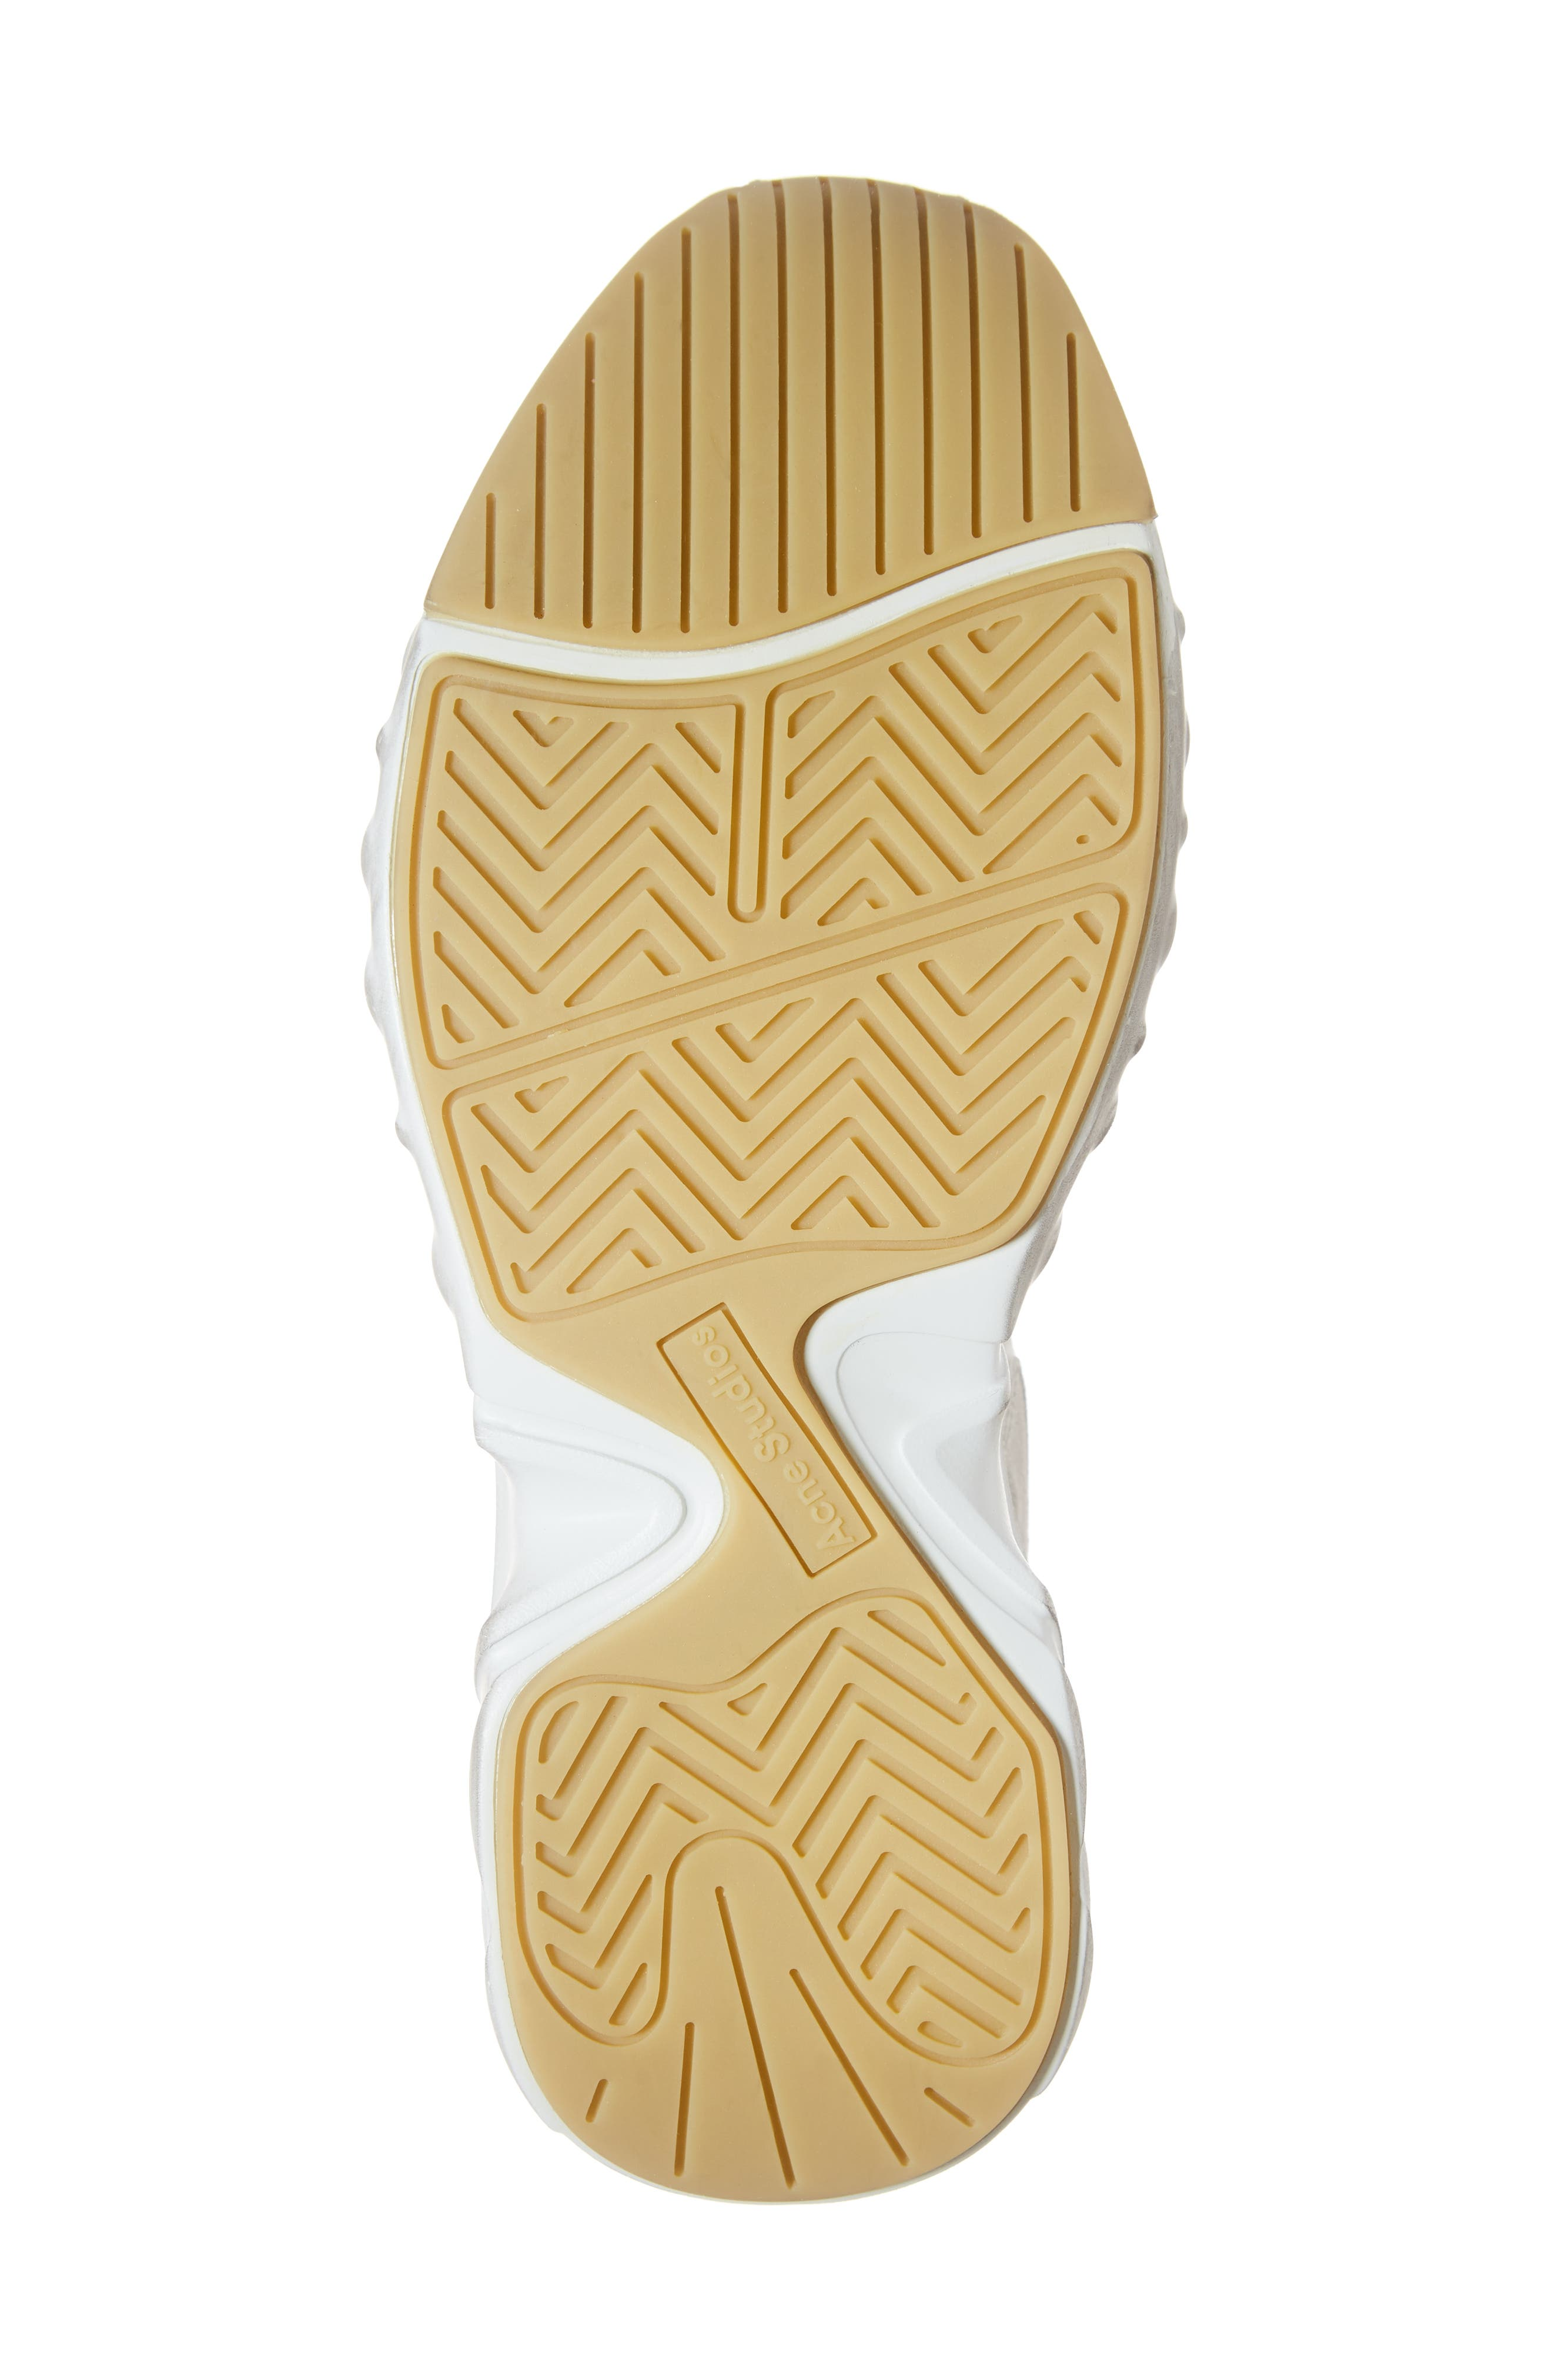 Rockaway Built-Up Sneaker,                             Alternate thumbnail 6, color,                             WHITE